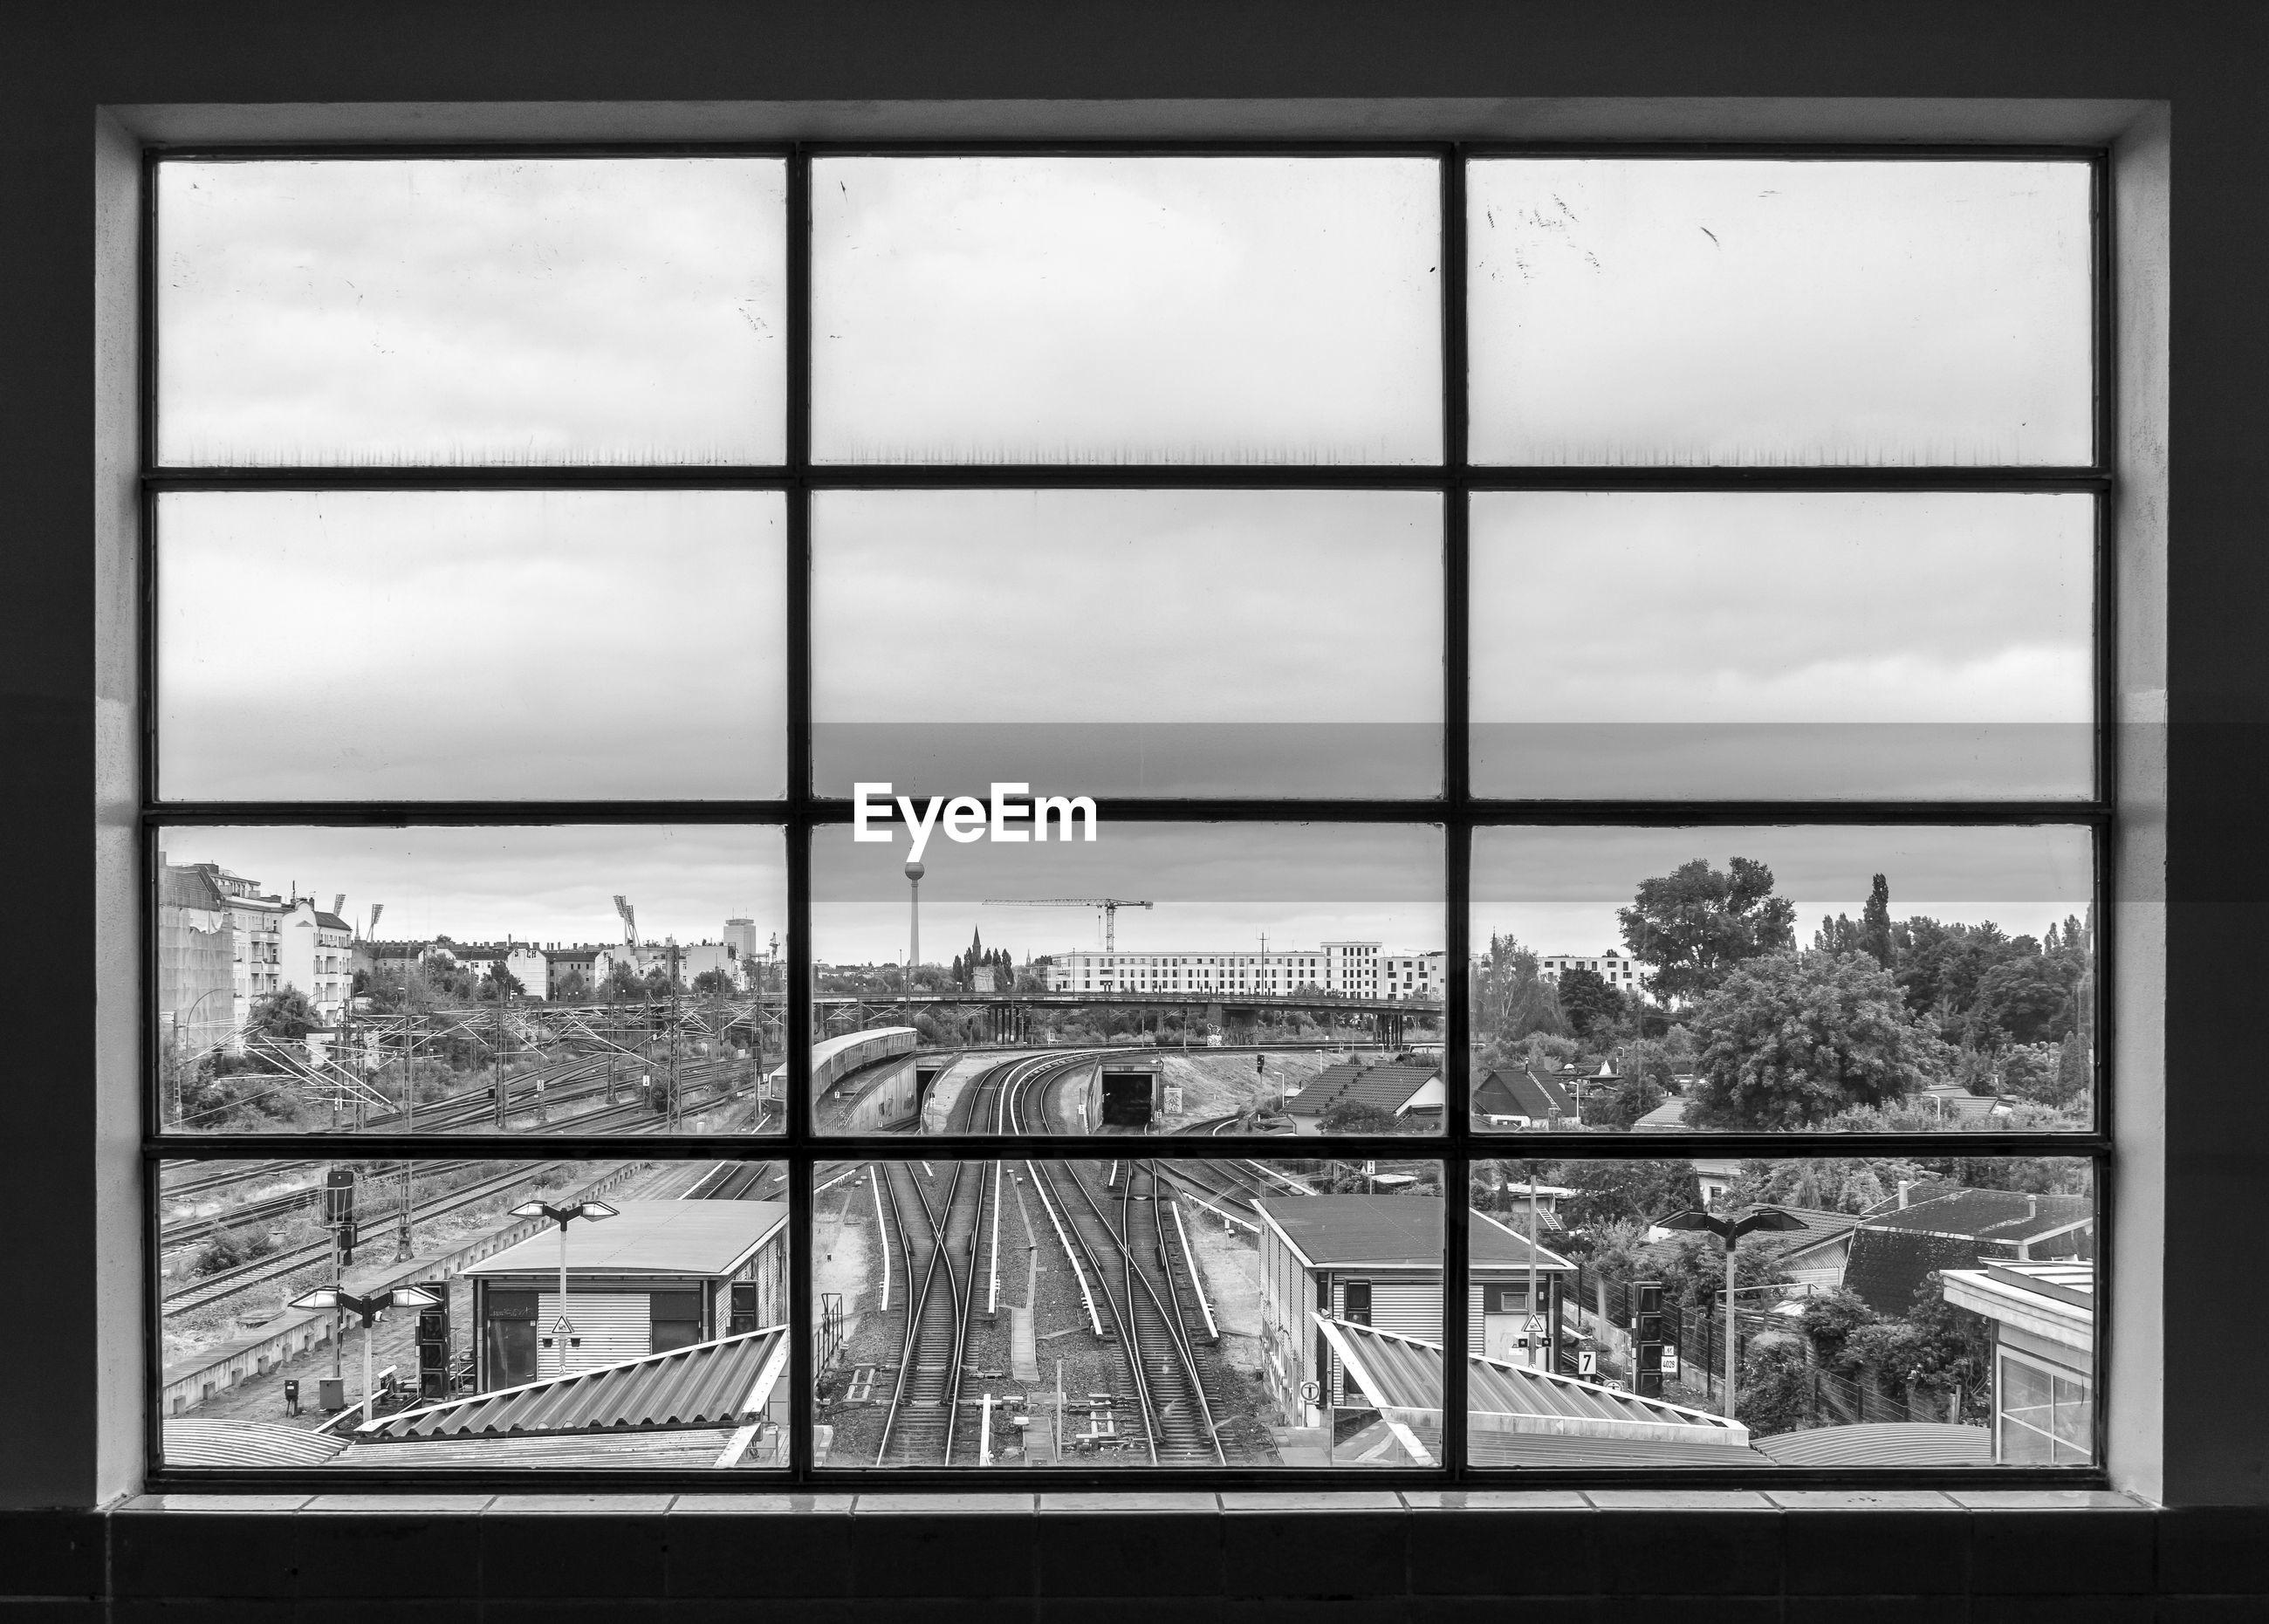 City seen through glass window